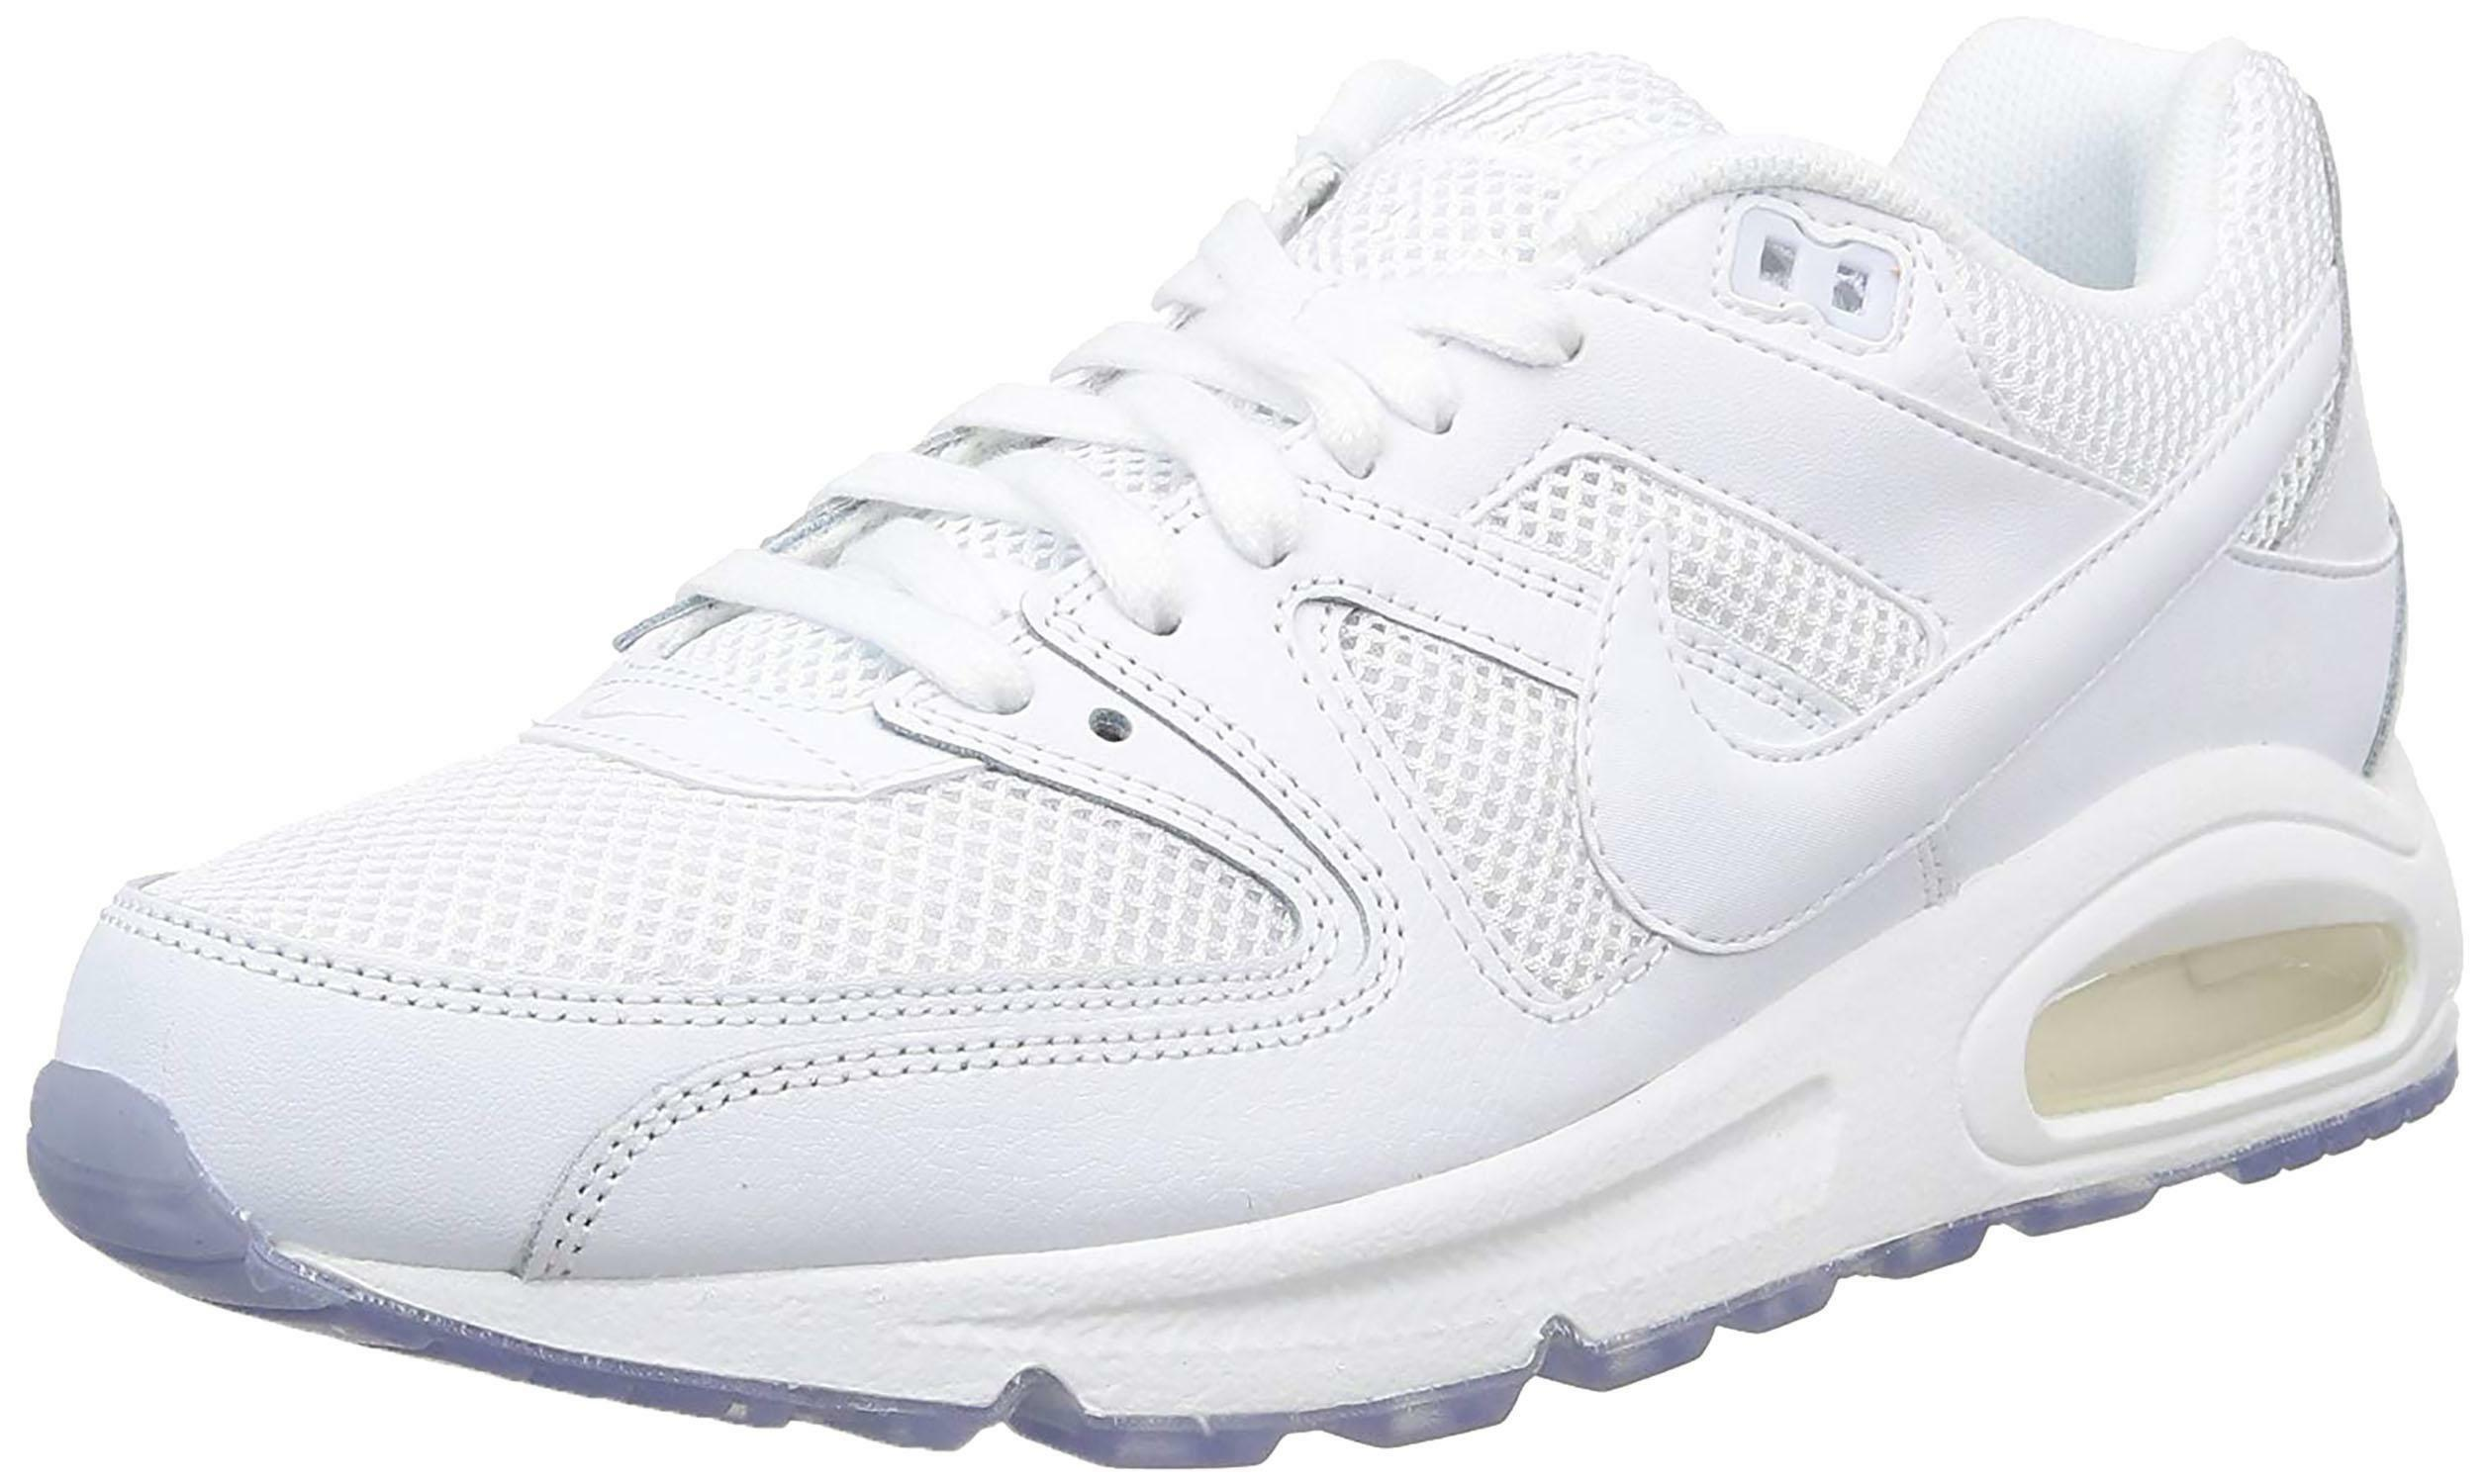 scarpe uomo nike air max bianche